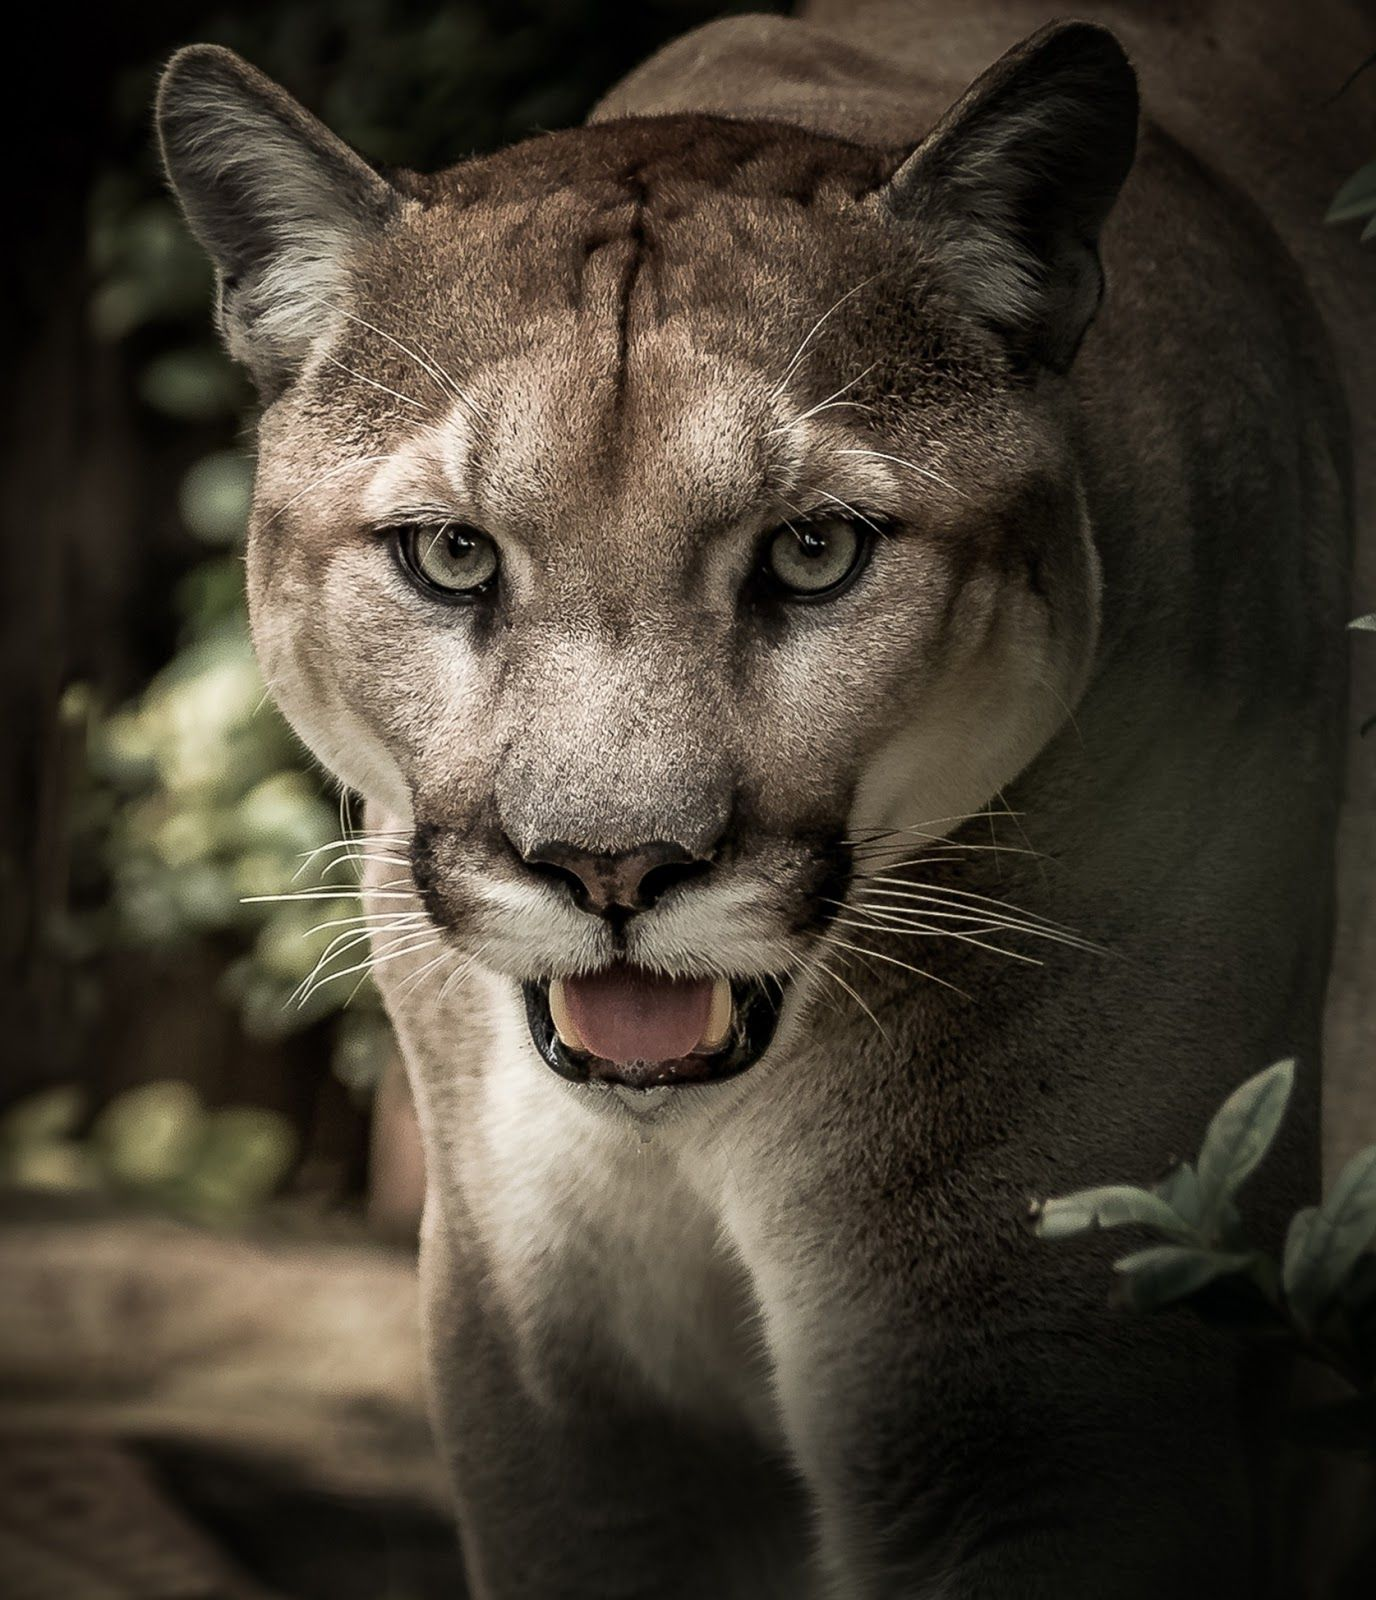 About Wild Animals PumaThe elusive wild cat Big cat